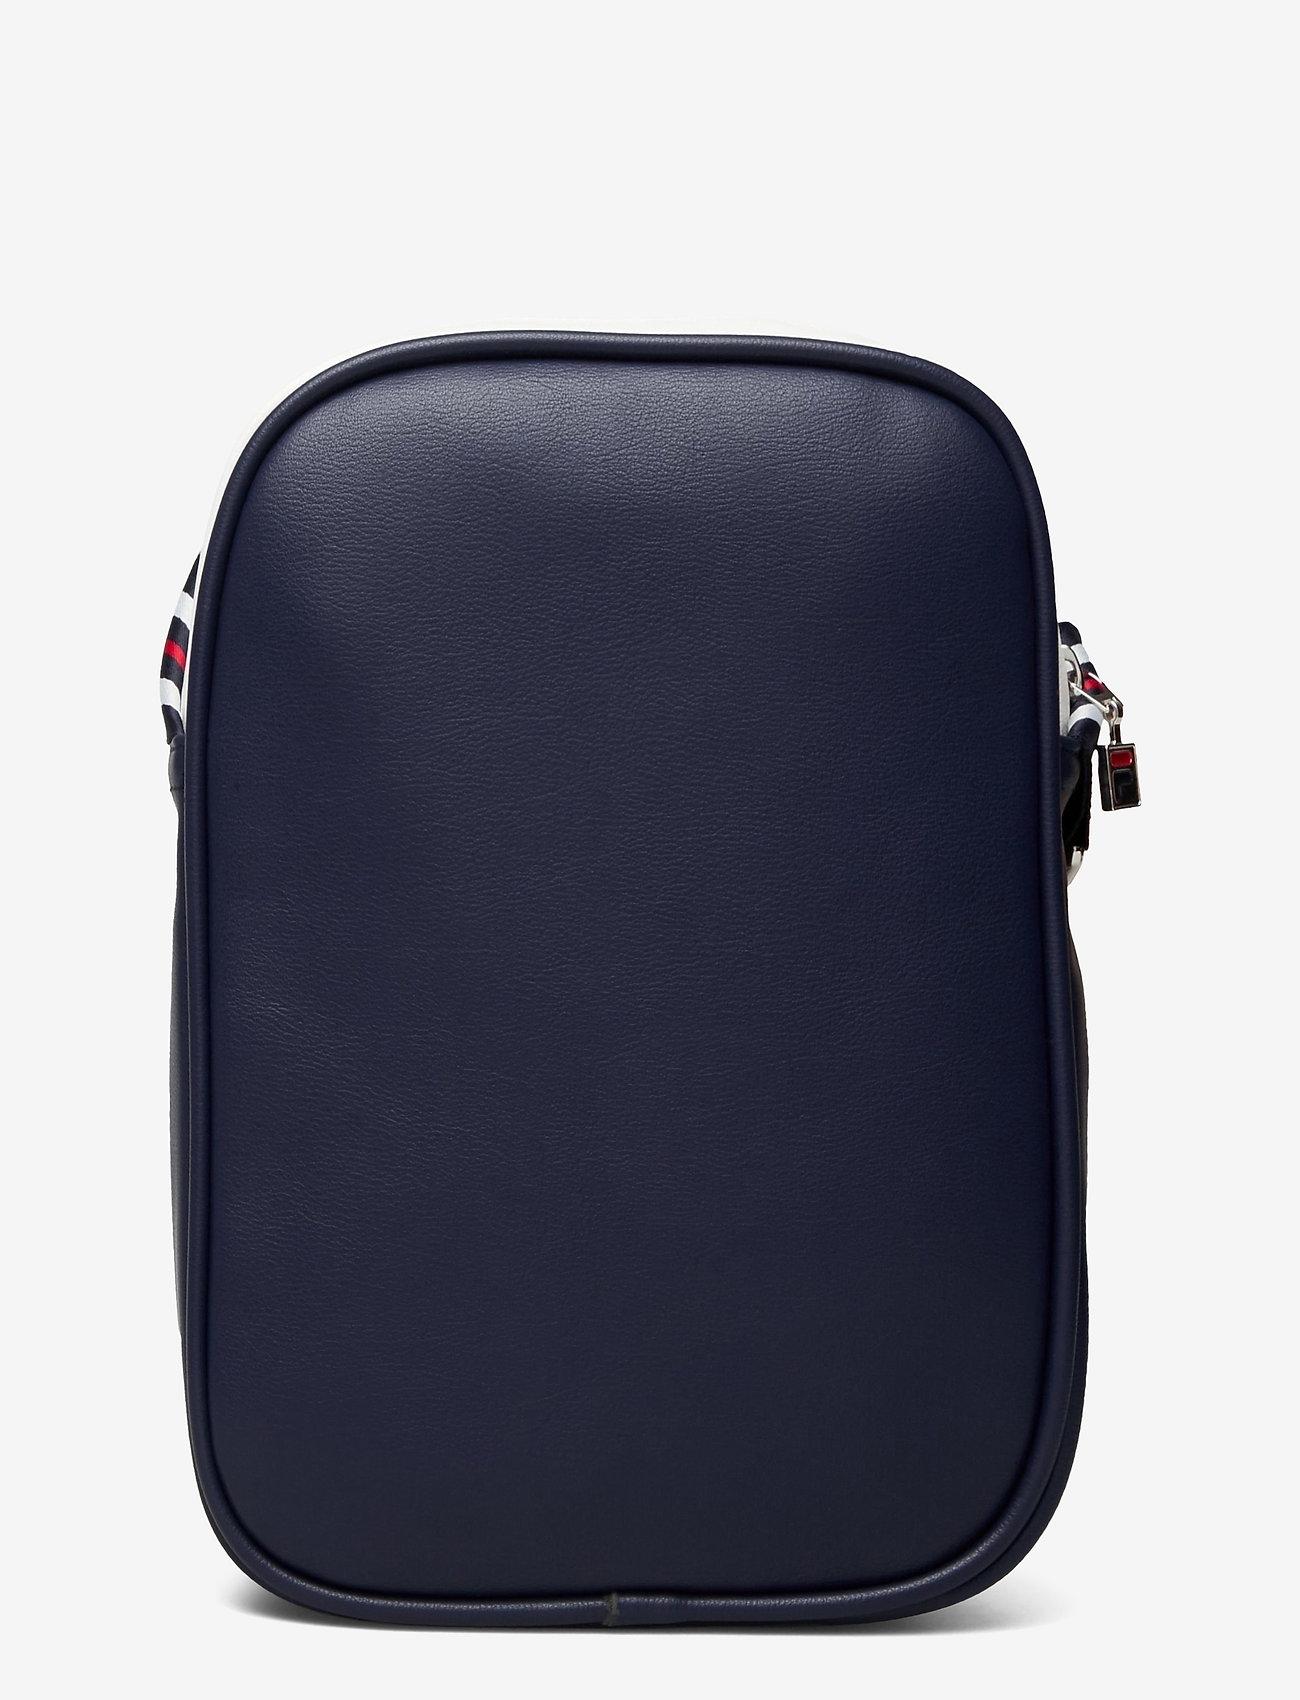 FILA - HERITAGE PUSHER BAG - sacs à bandoulière - black iris-bright white-true red - 1